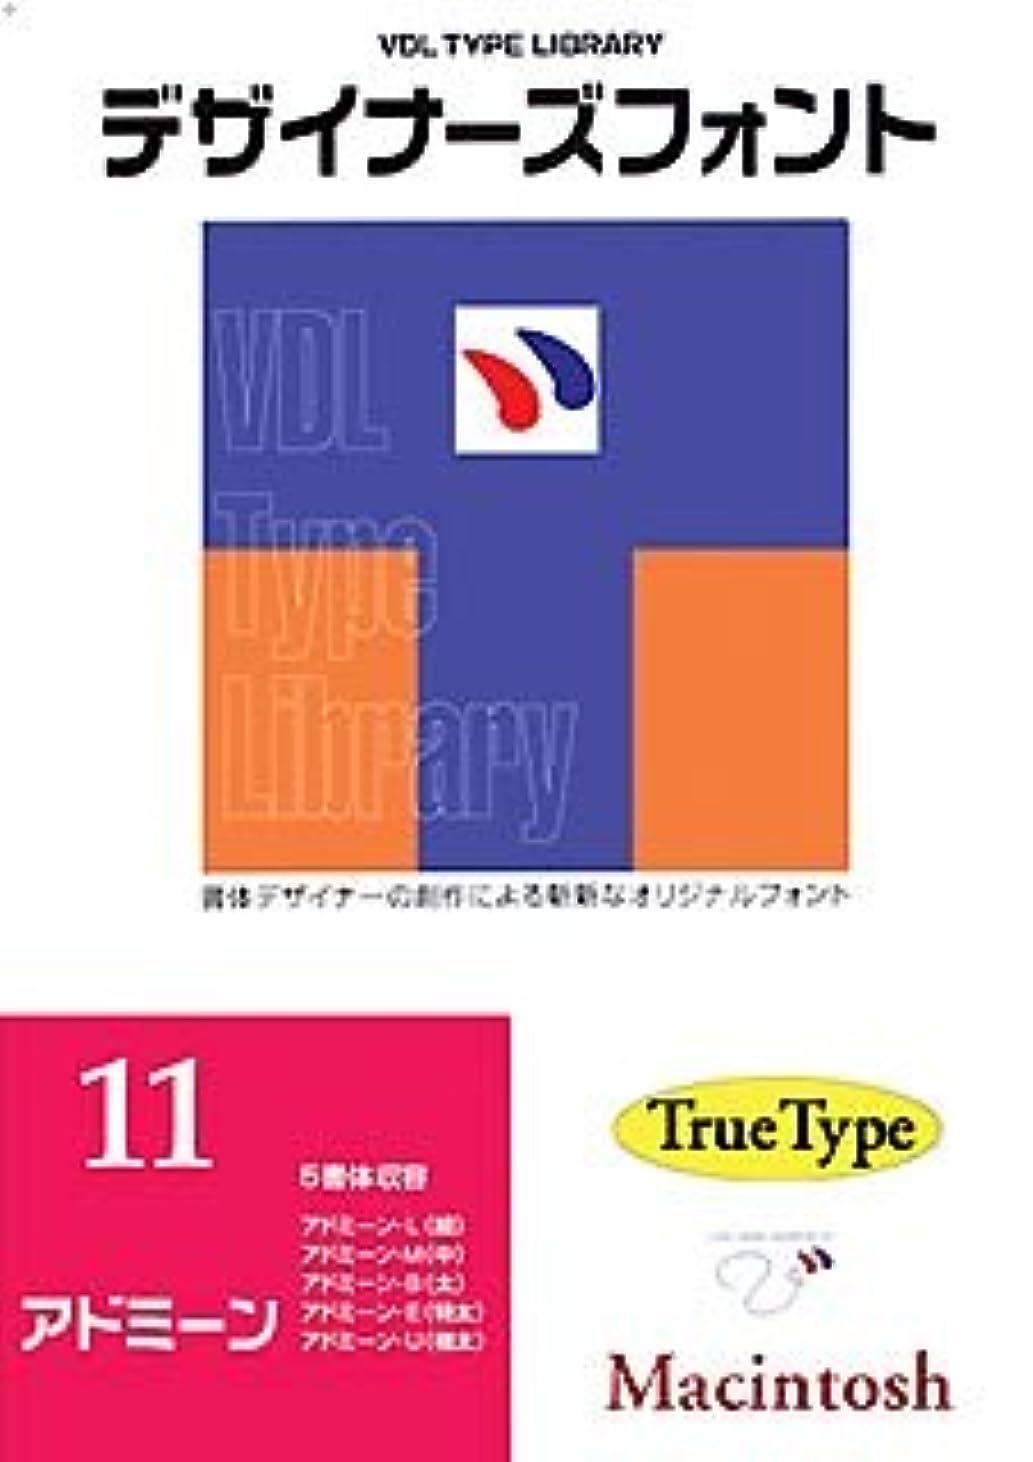 VDL Type Library デザイナーズフォント TrueType Macintosh Vol.11 アドミーン